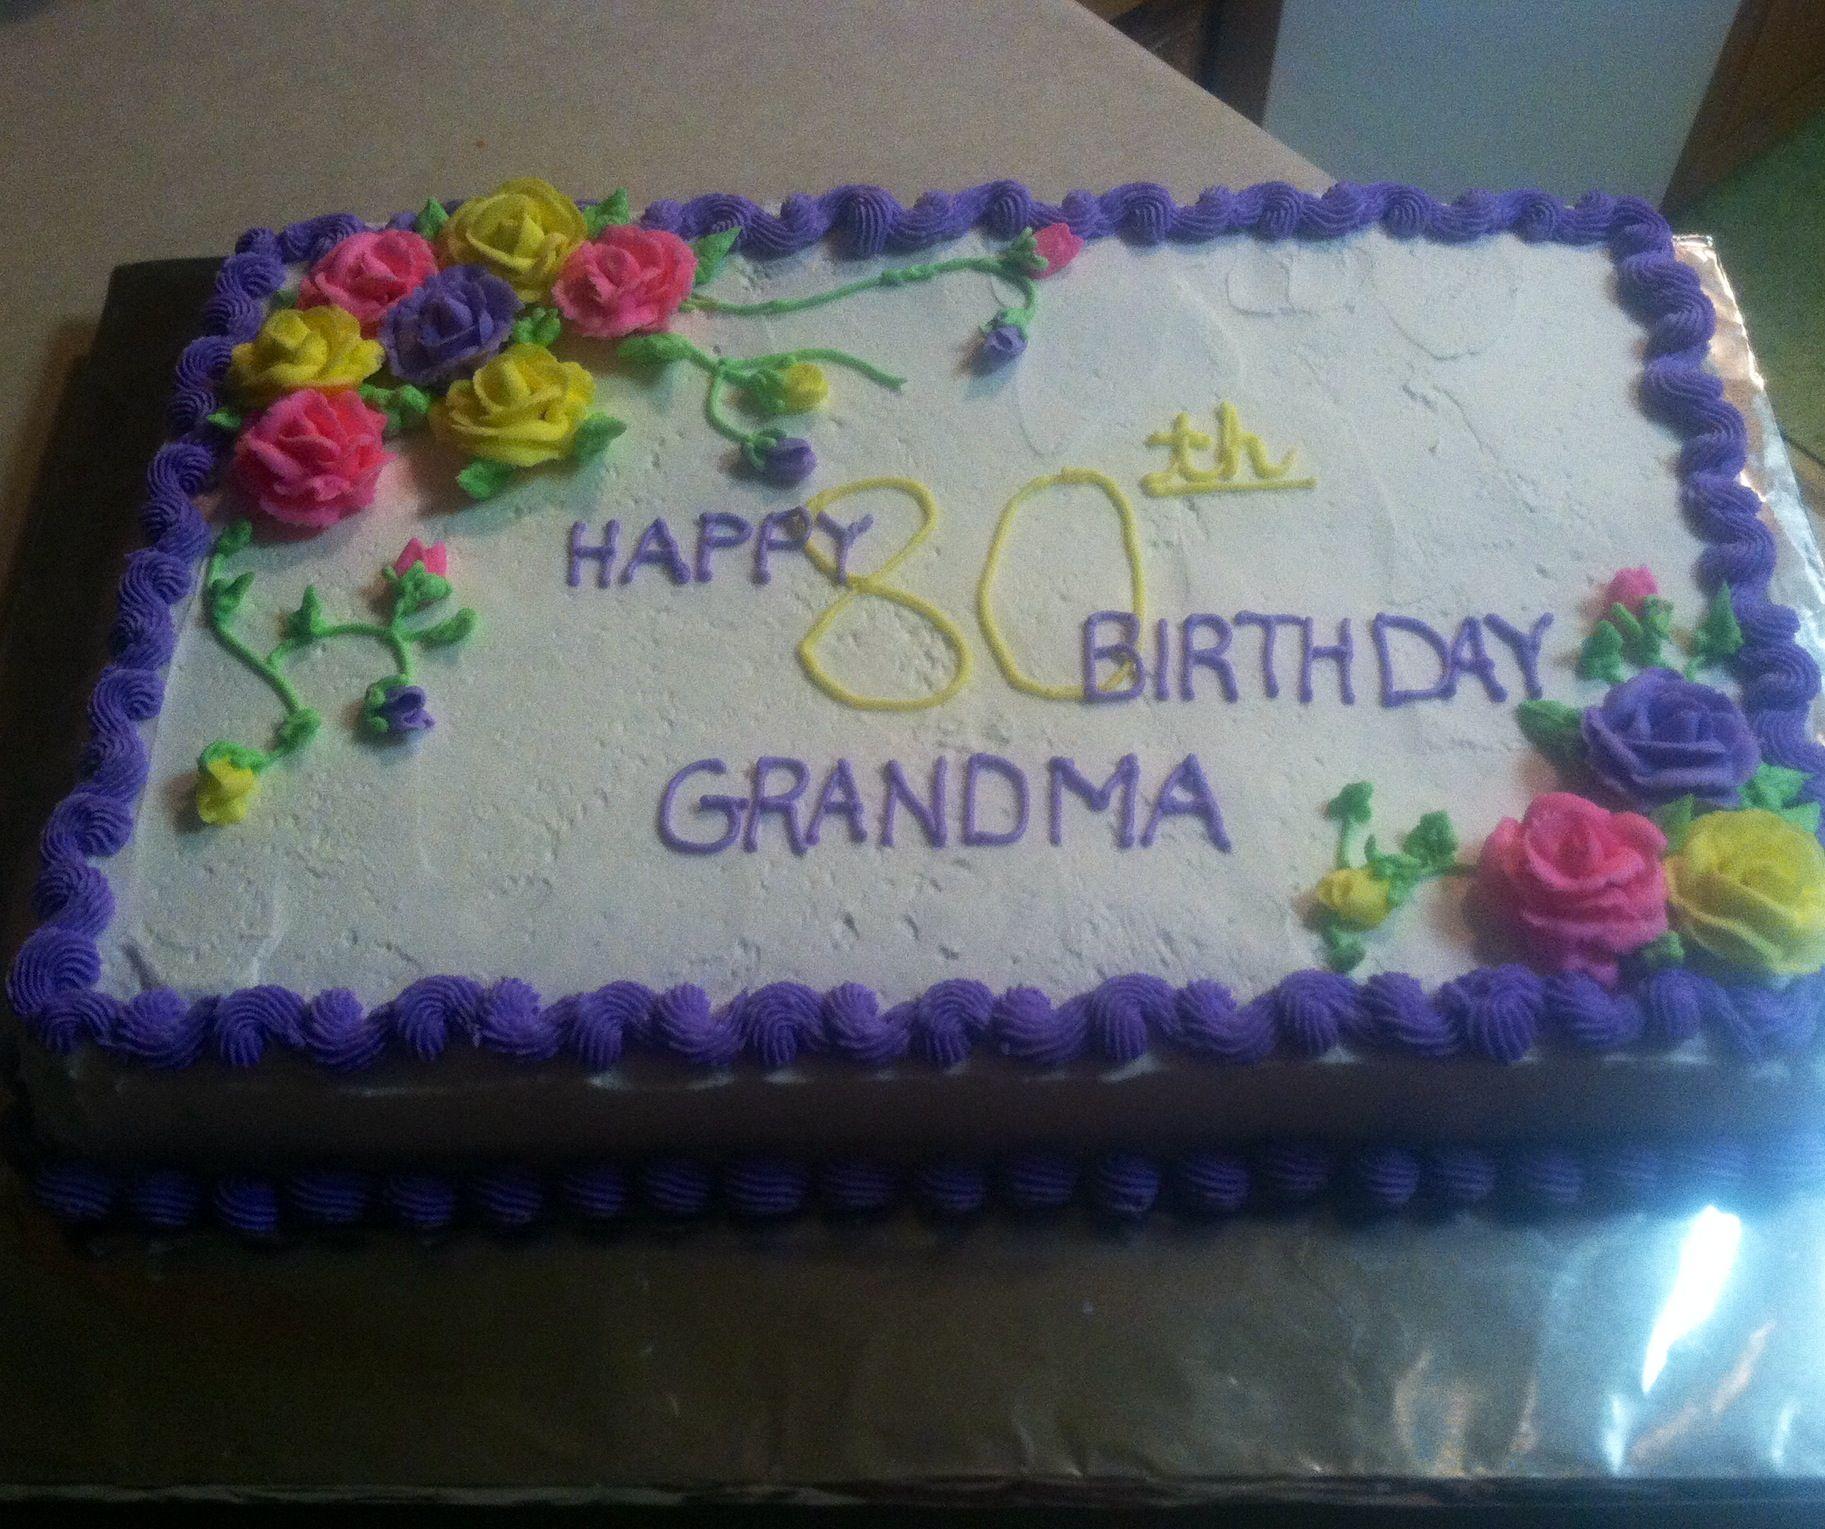 Birthday cake ideas Pinterest Cake pictures Cake and Birthdays